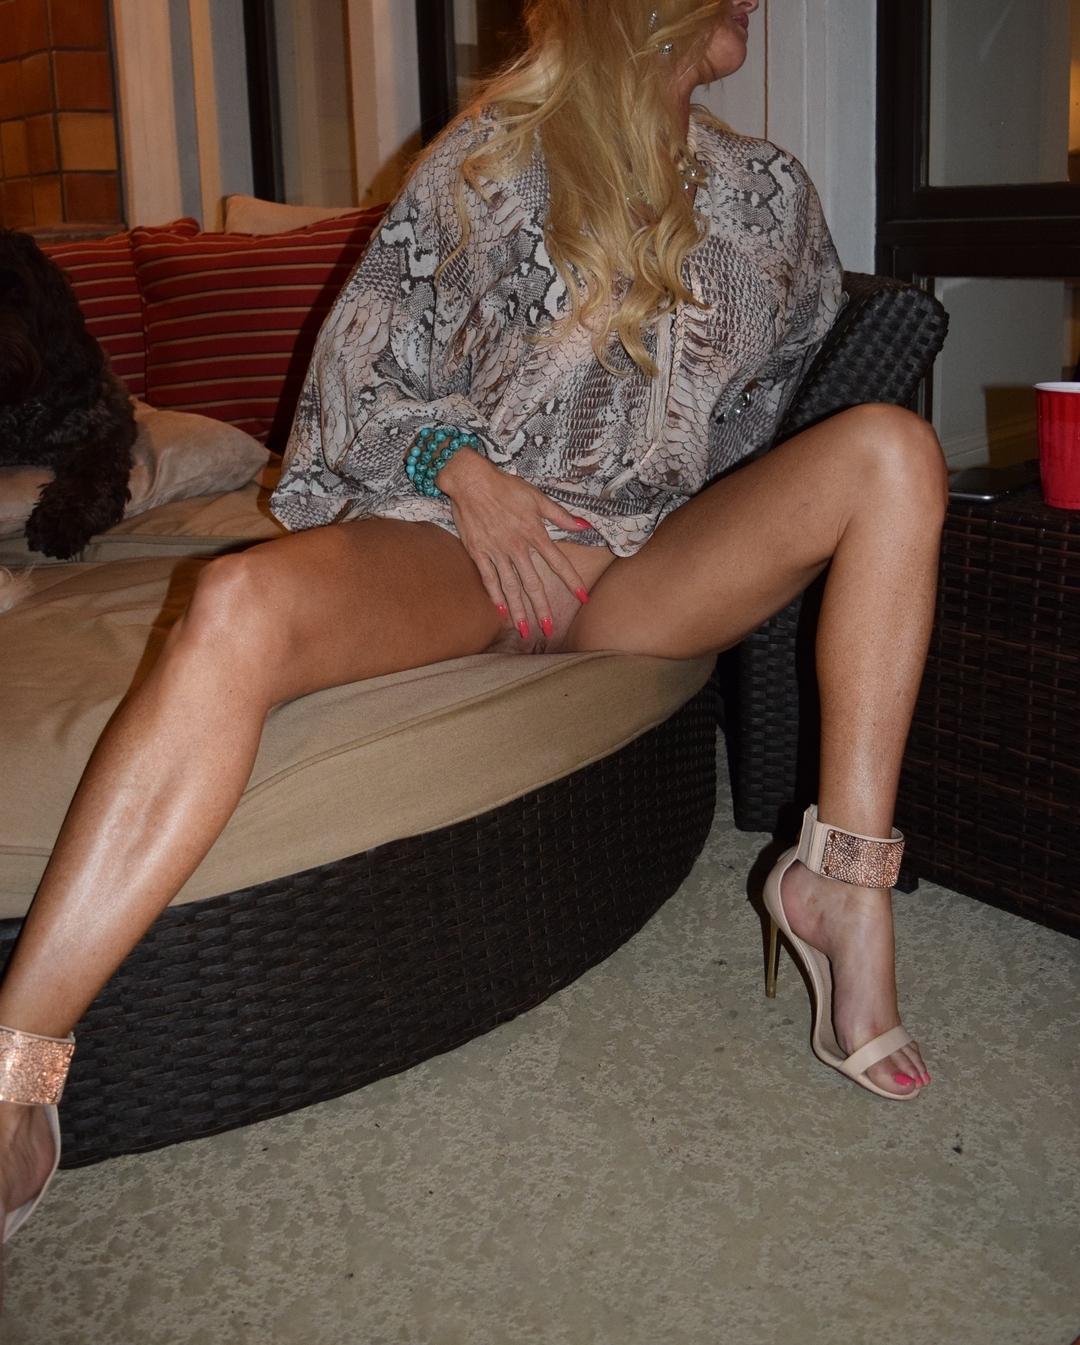 Bellasouth Lavidahermosa Onlyfans Nudes Leaks 0008